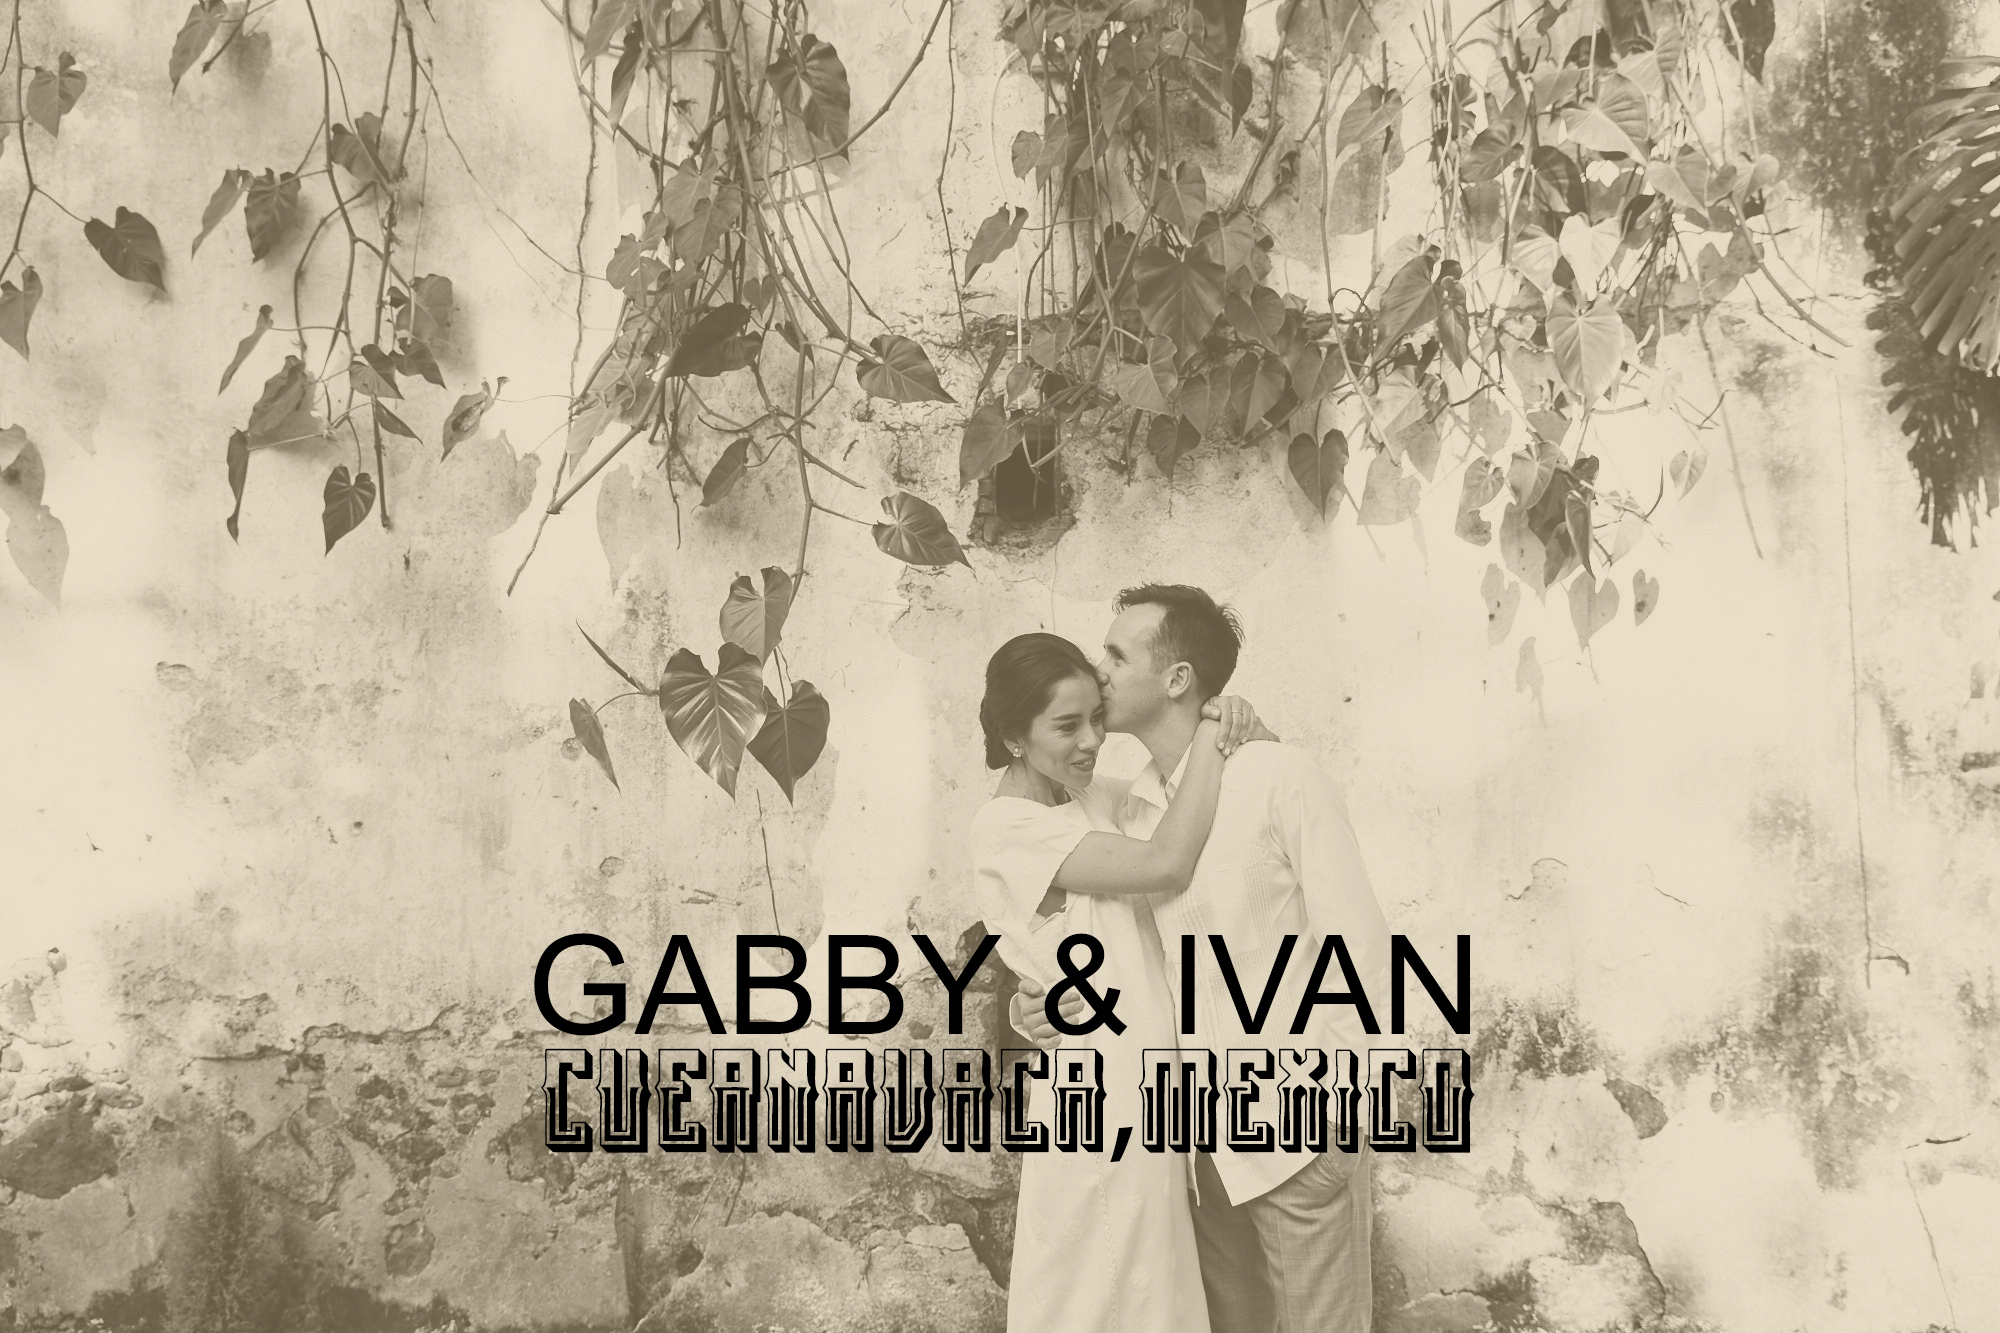 LJL_GabbyandIVan_Mexico_Cover.jpg